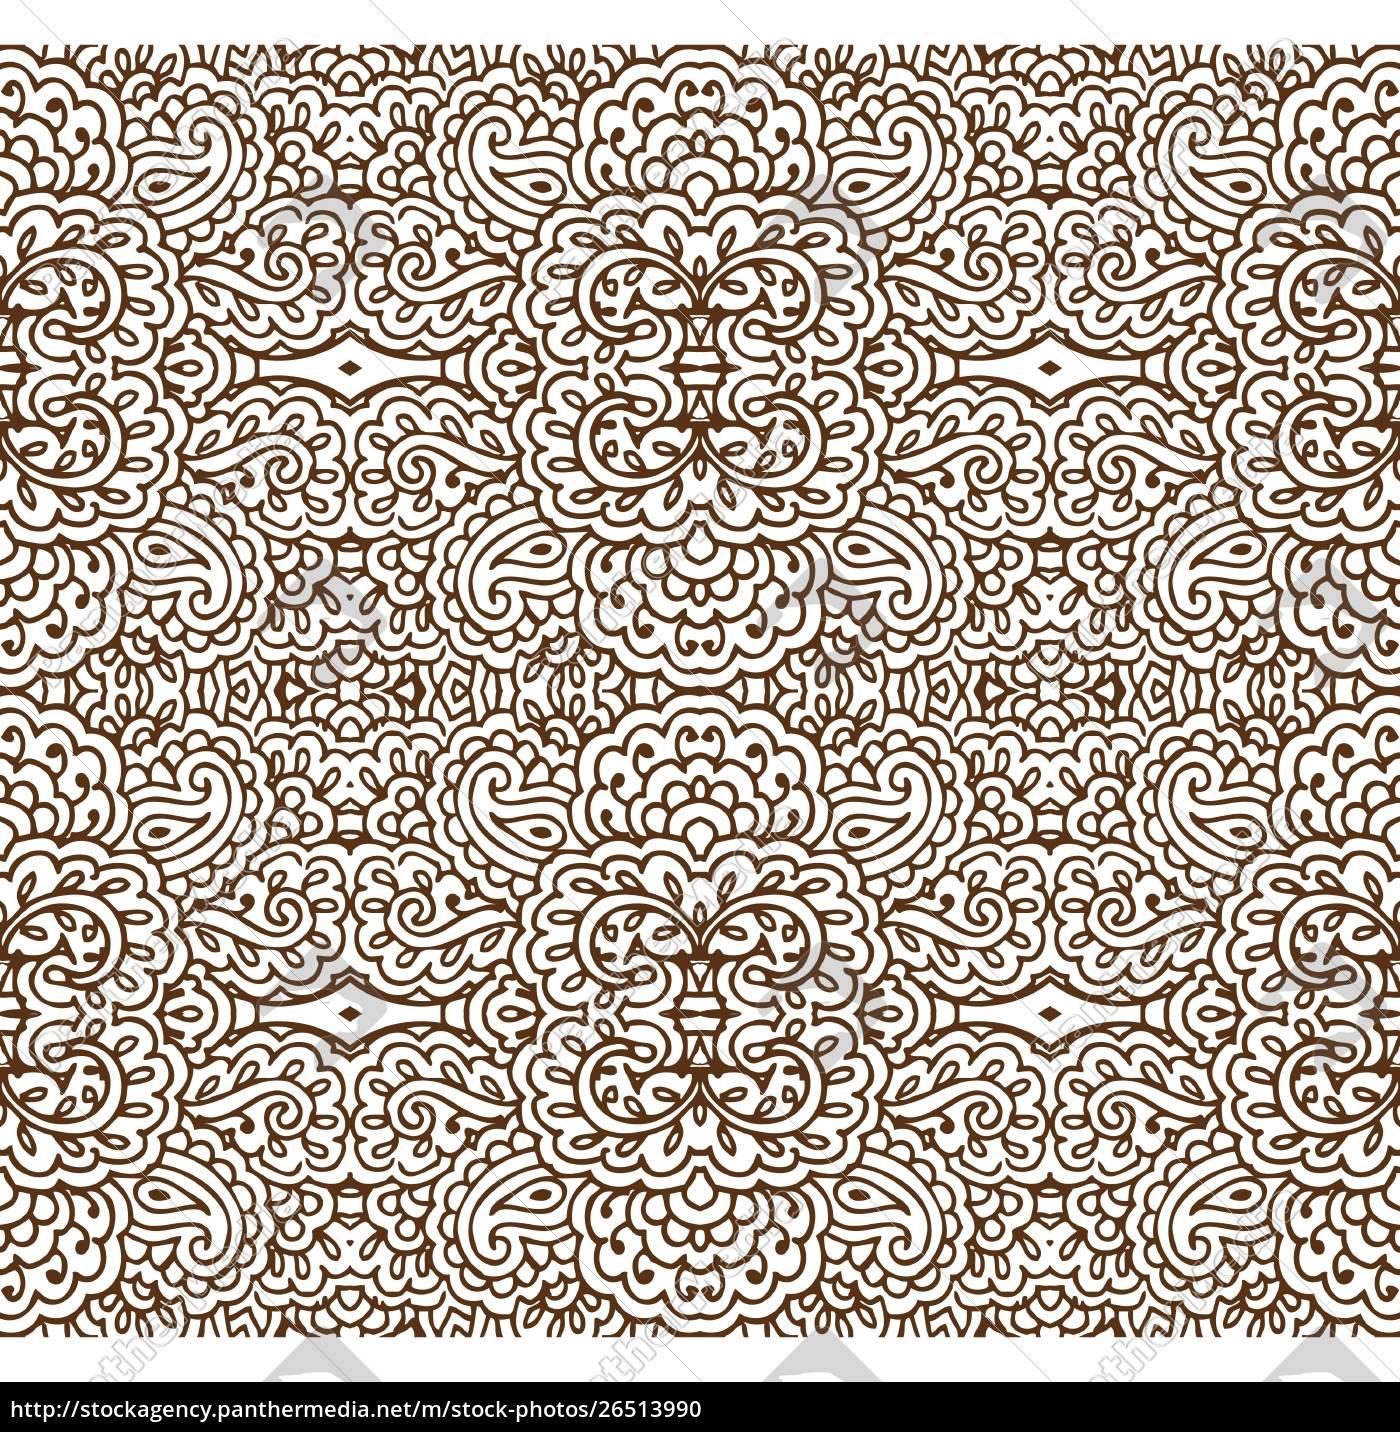 nahtloses, sepia-tapetenmuster - 26513990